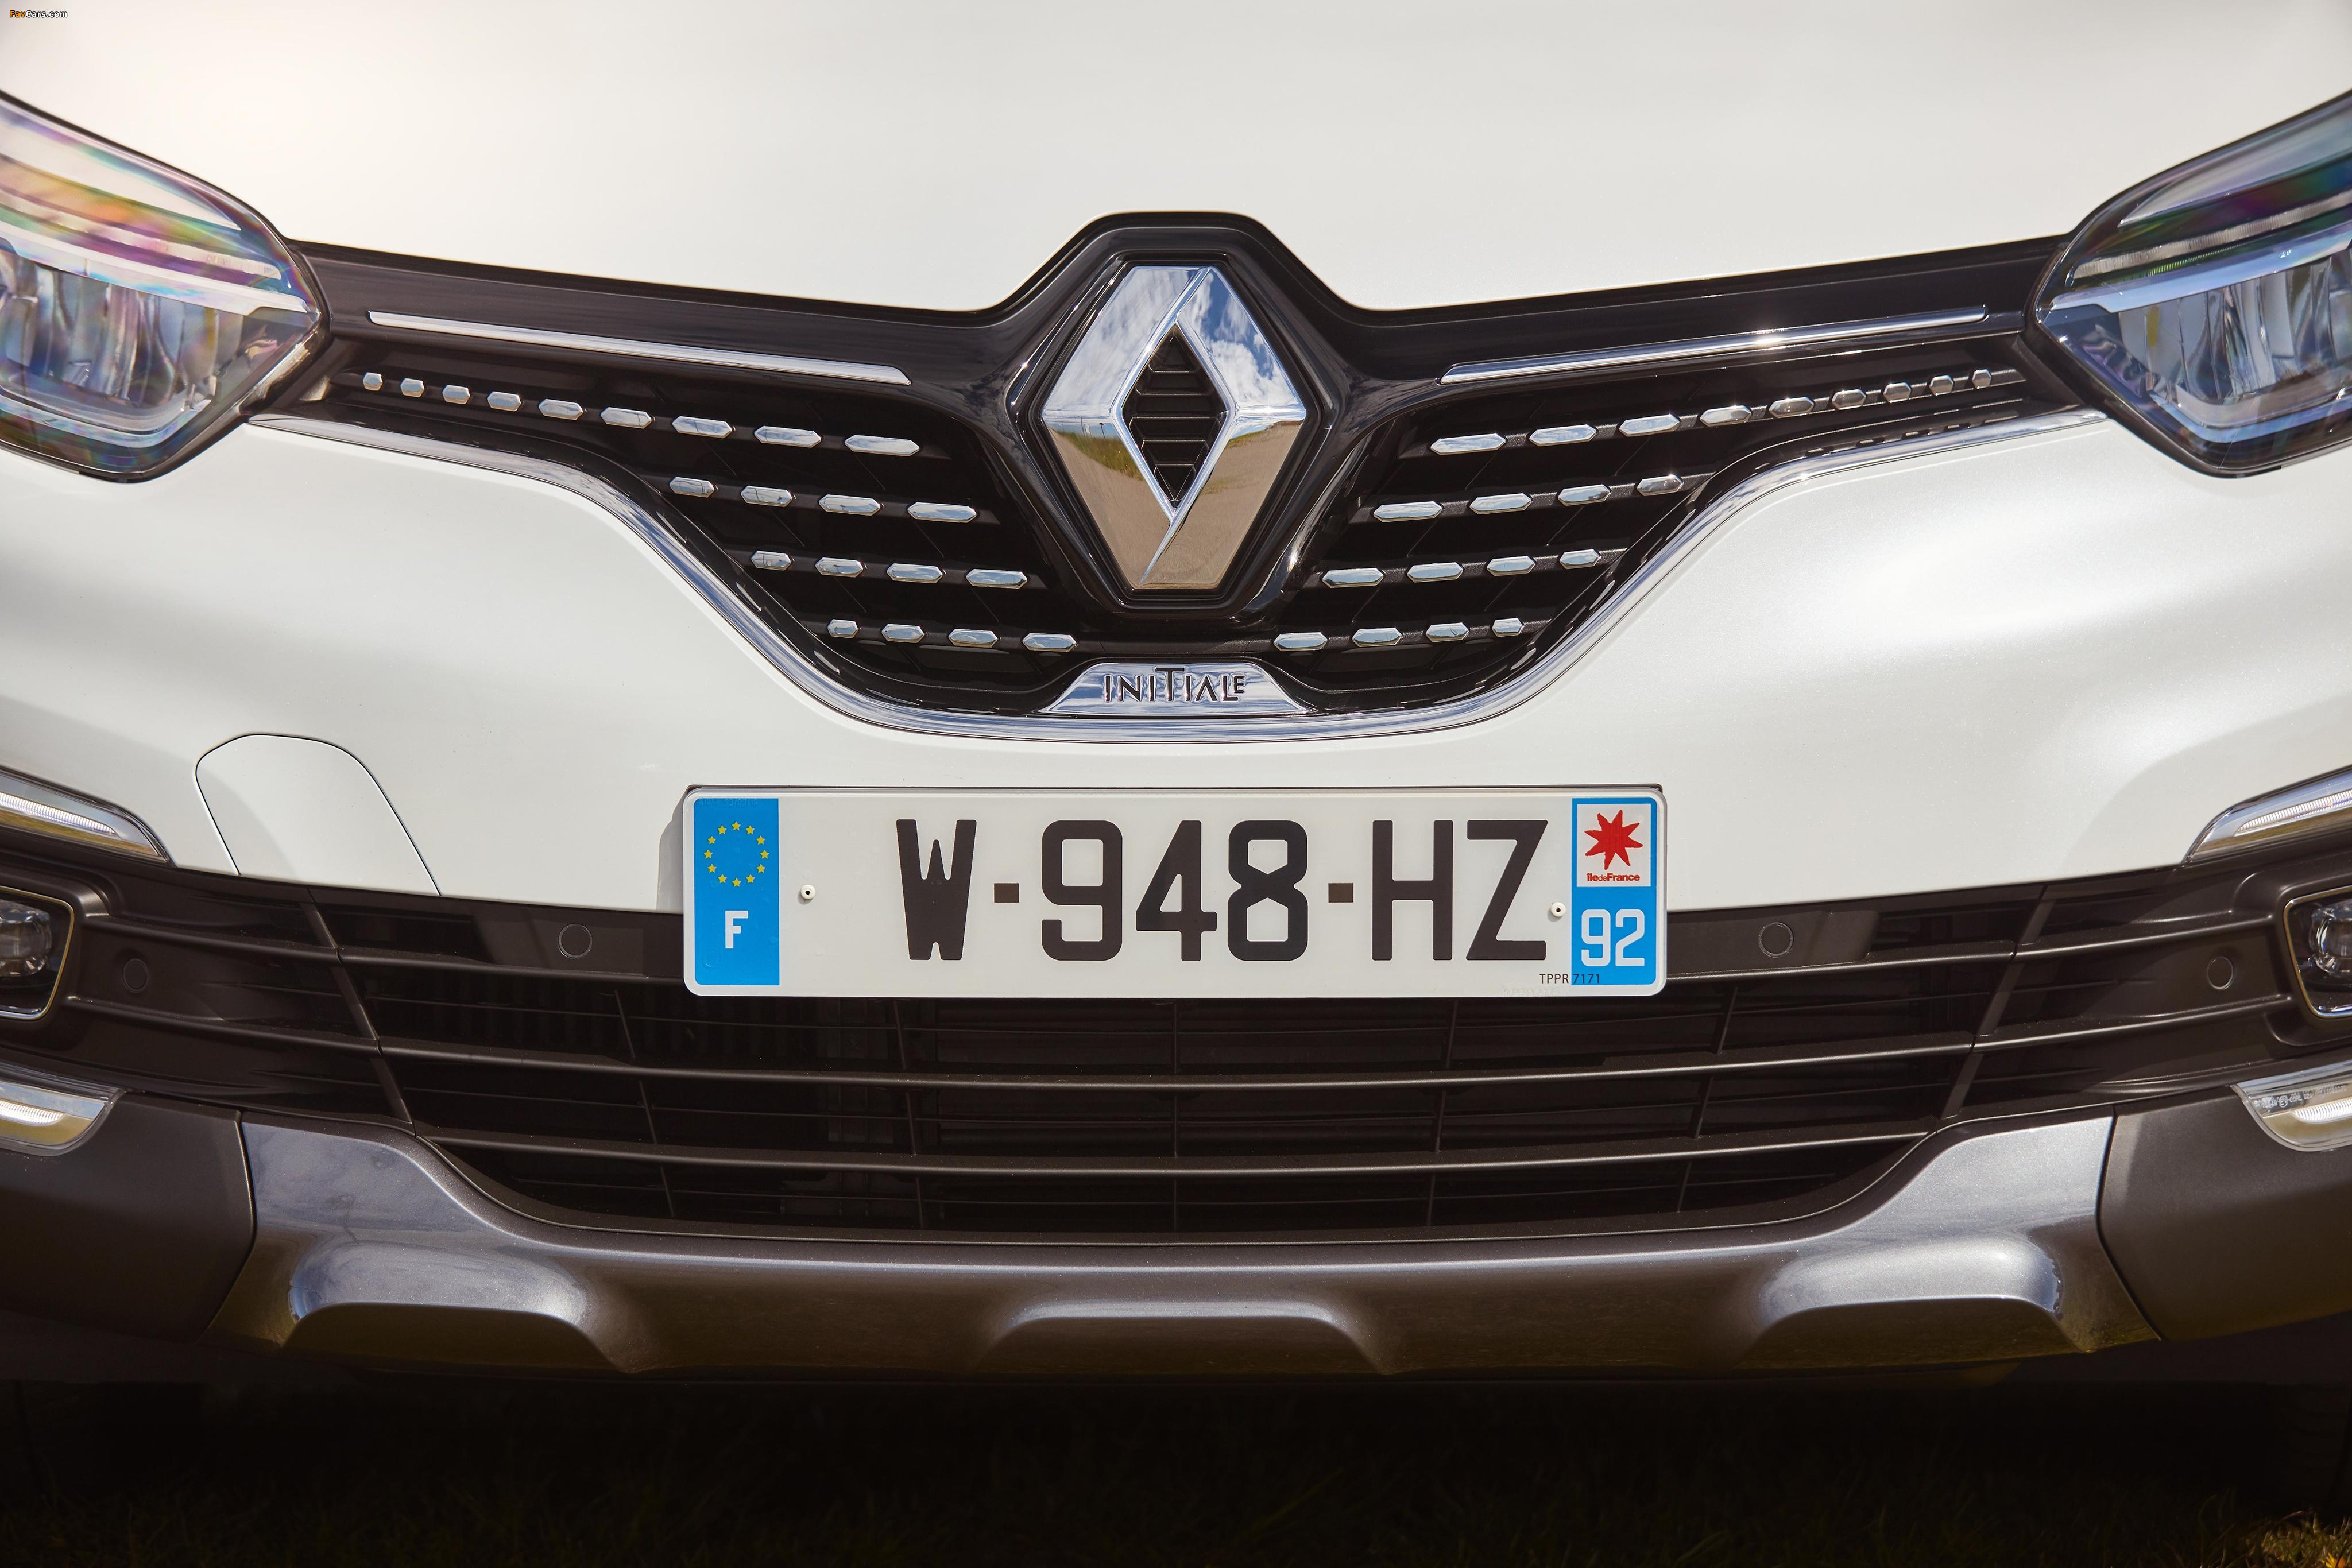 Renault Captur Initiale Paris 2017 wallpapers (4096 x 2731)